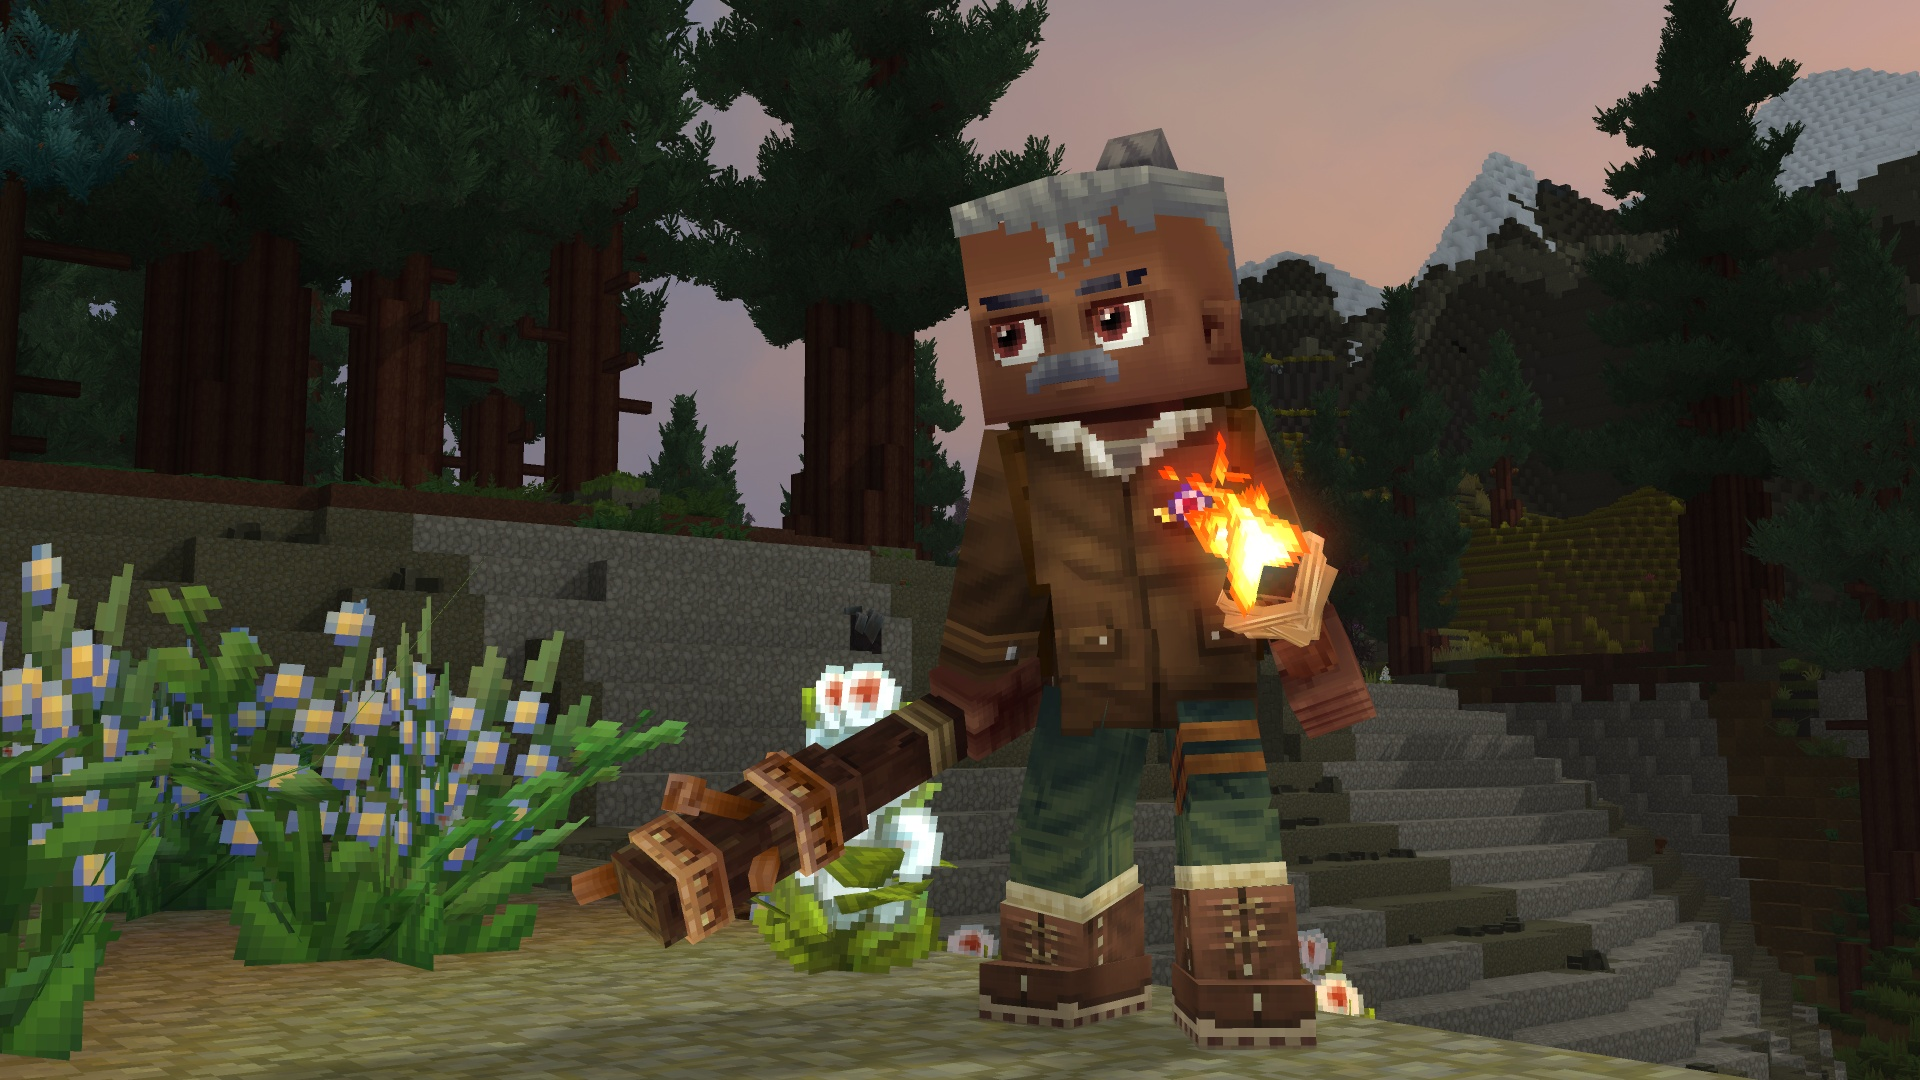 Riot Games купила Hypixel Studios, авторов Hytale